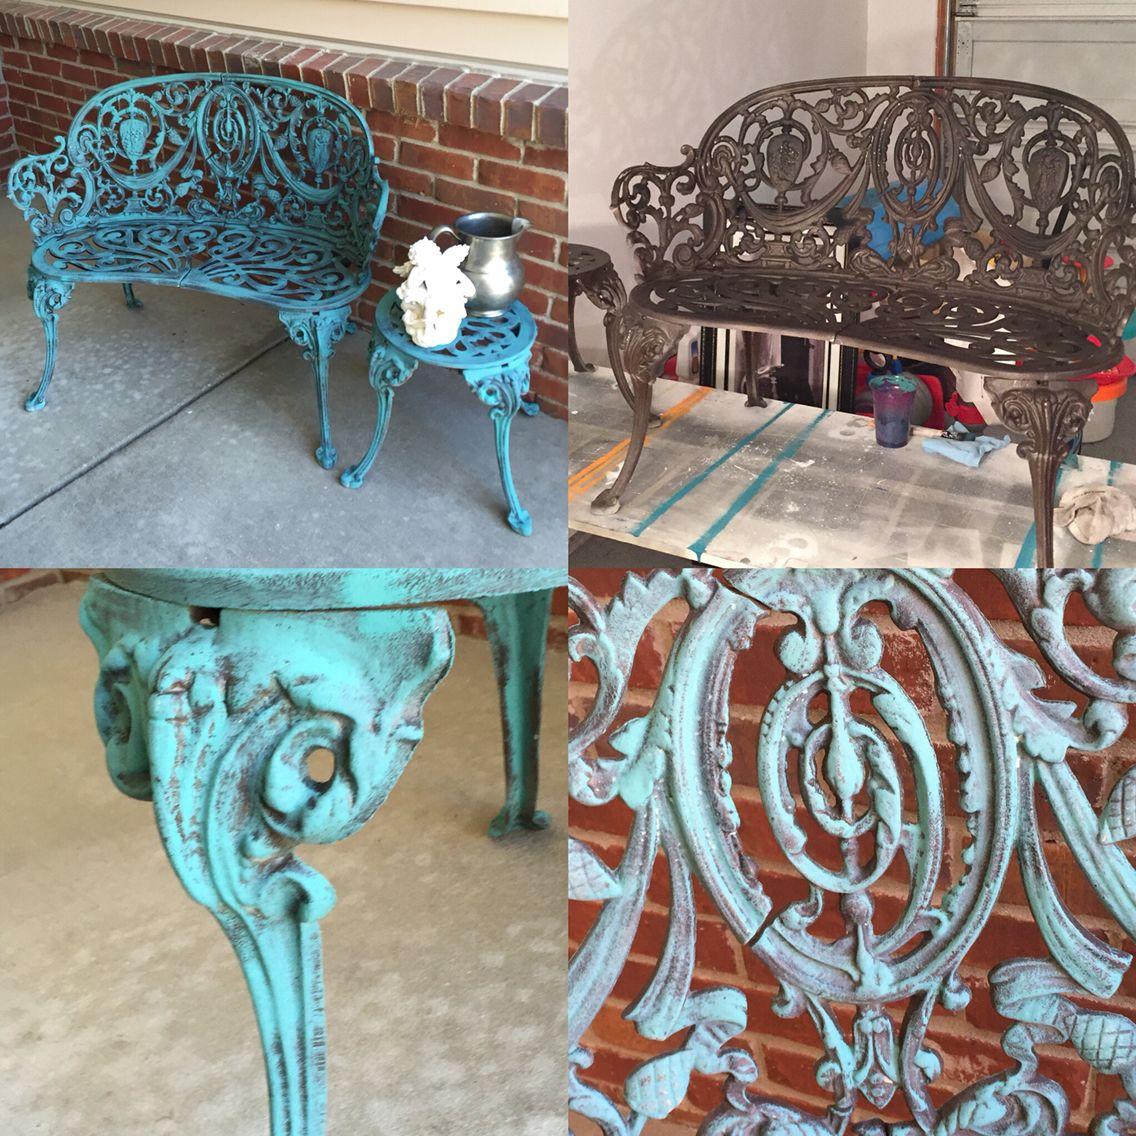 Download Wallpaper Wrought Iron Patio Furniture Repainting